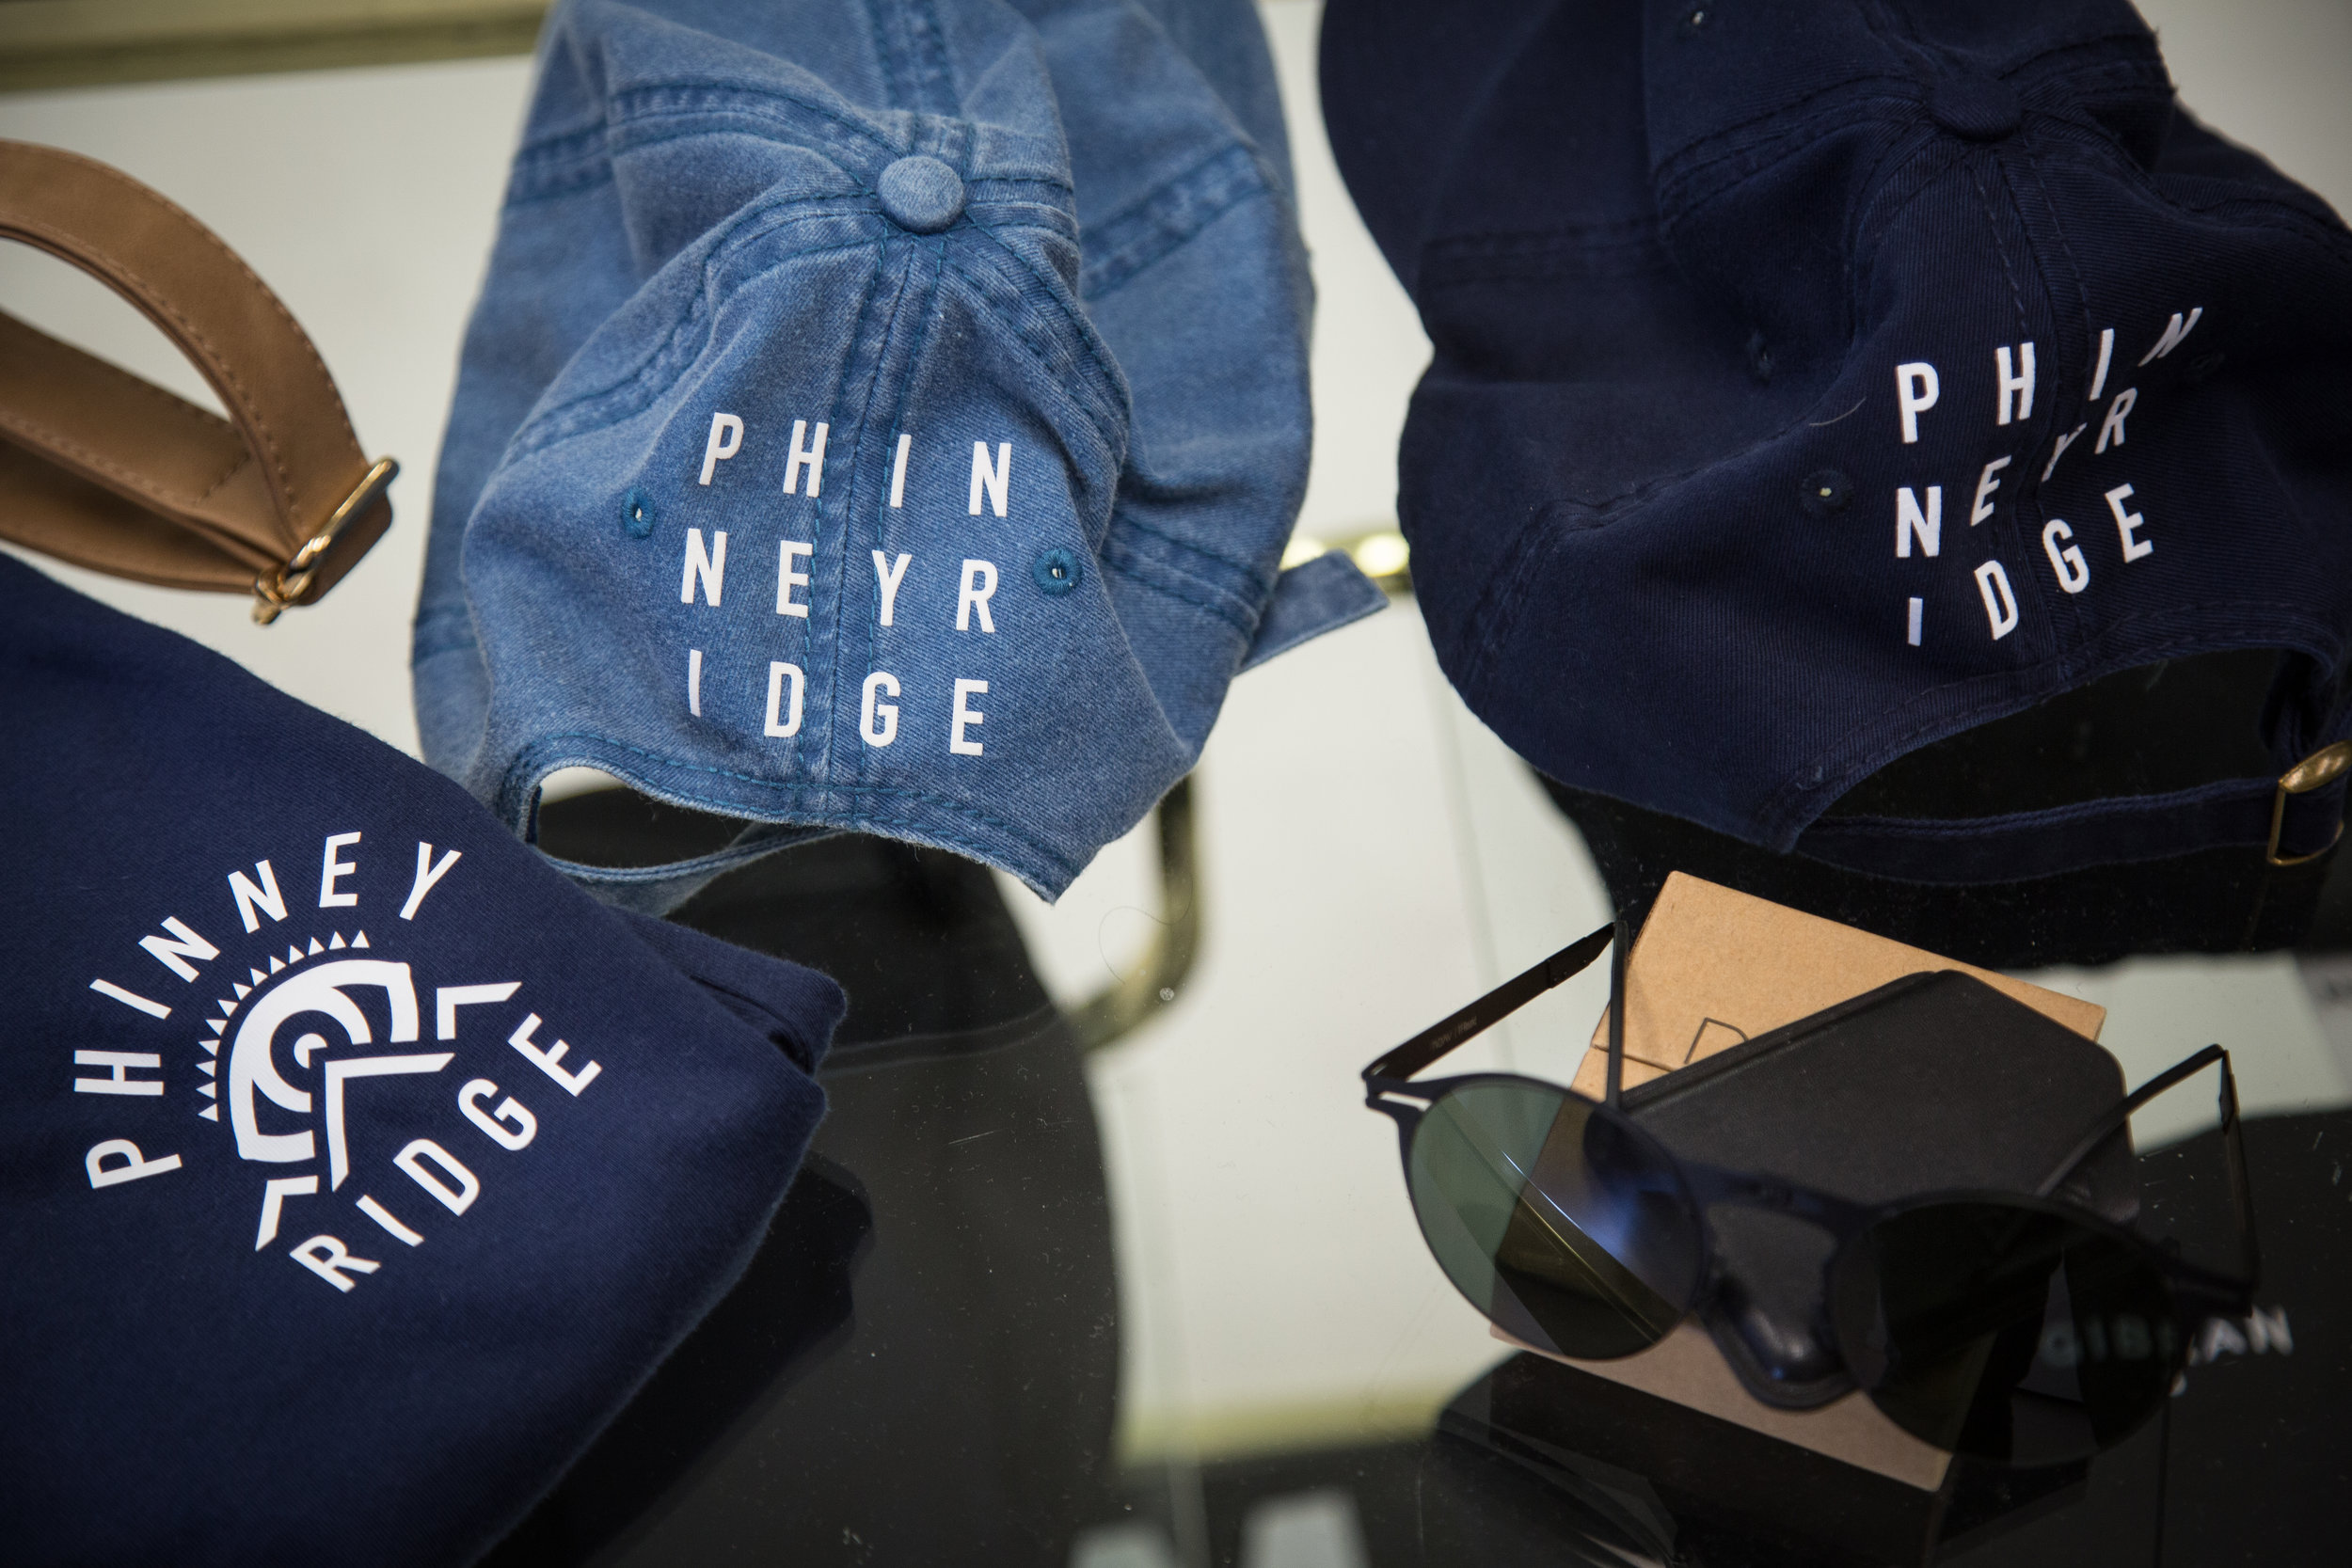 Phinney Ridge hats from Gibran.